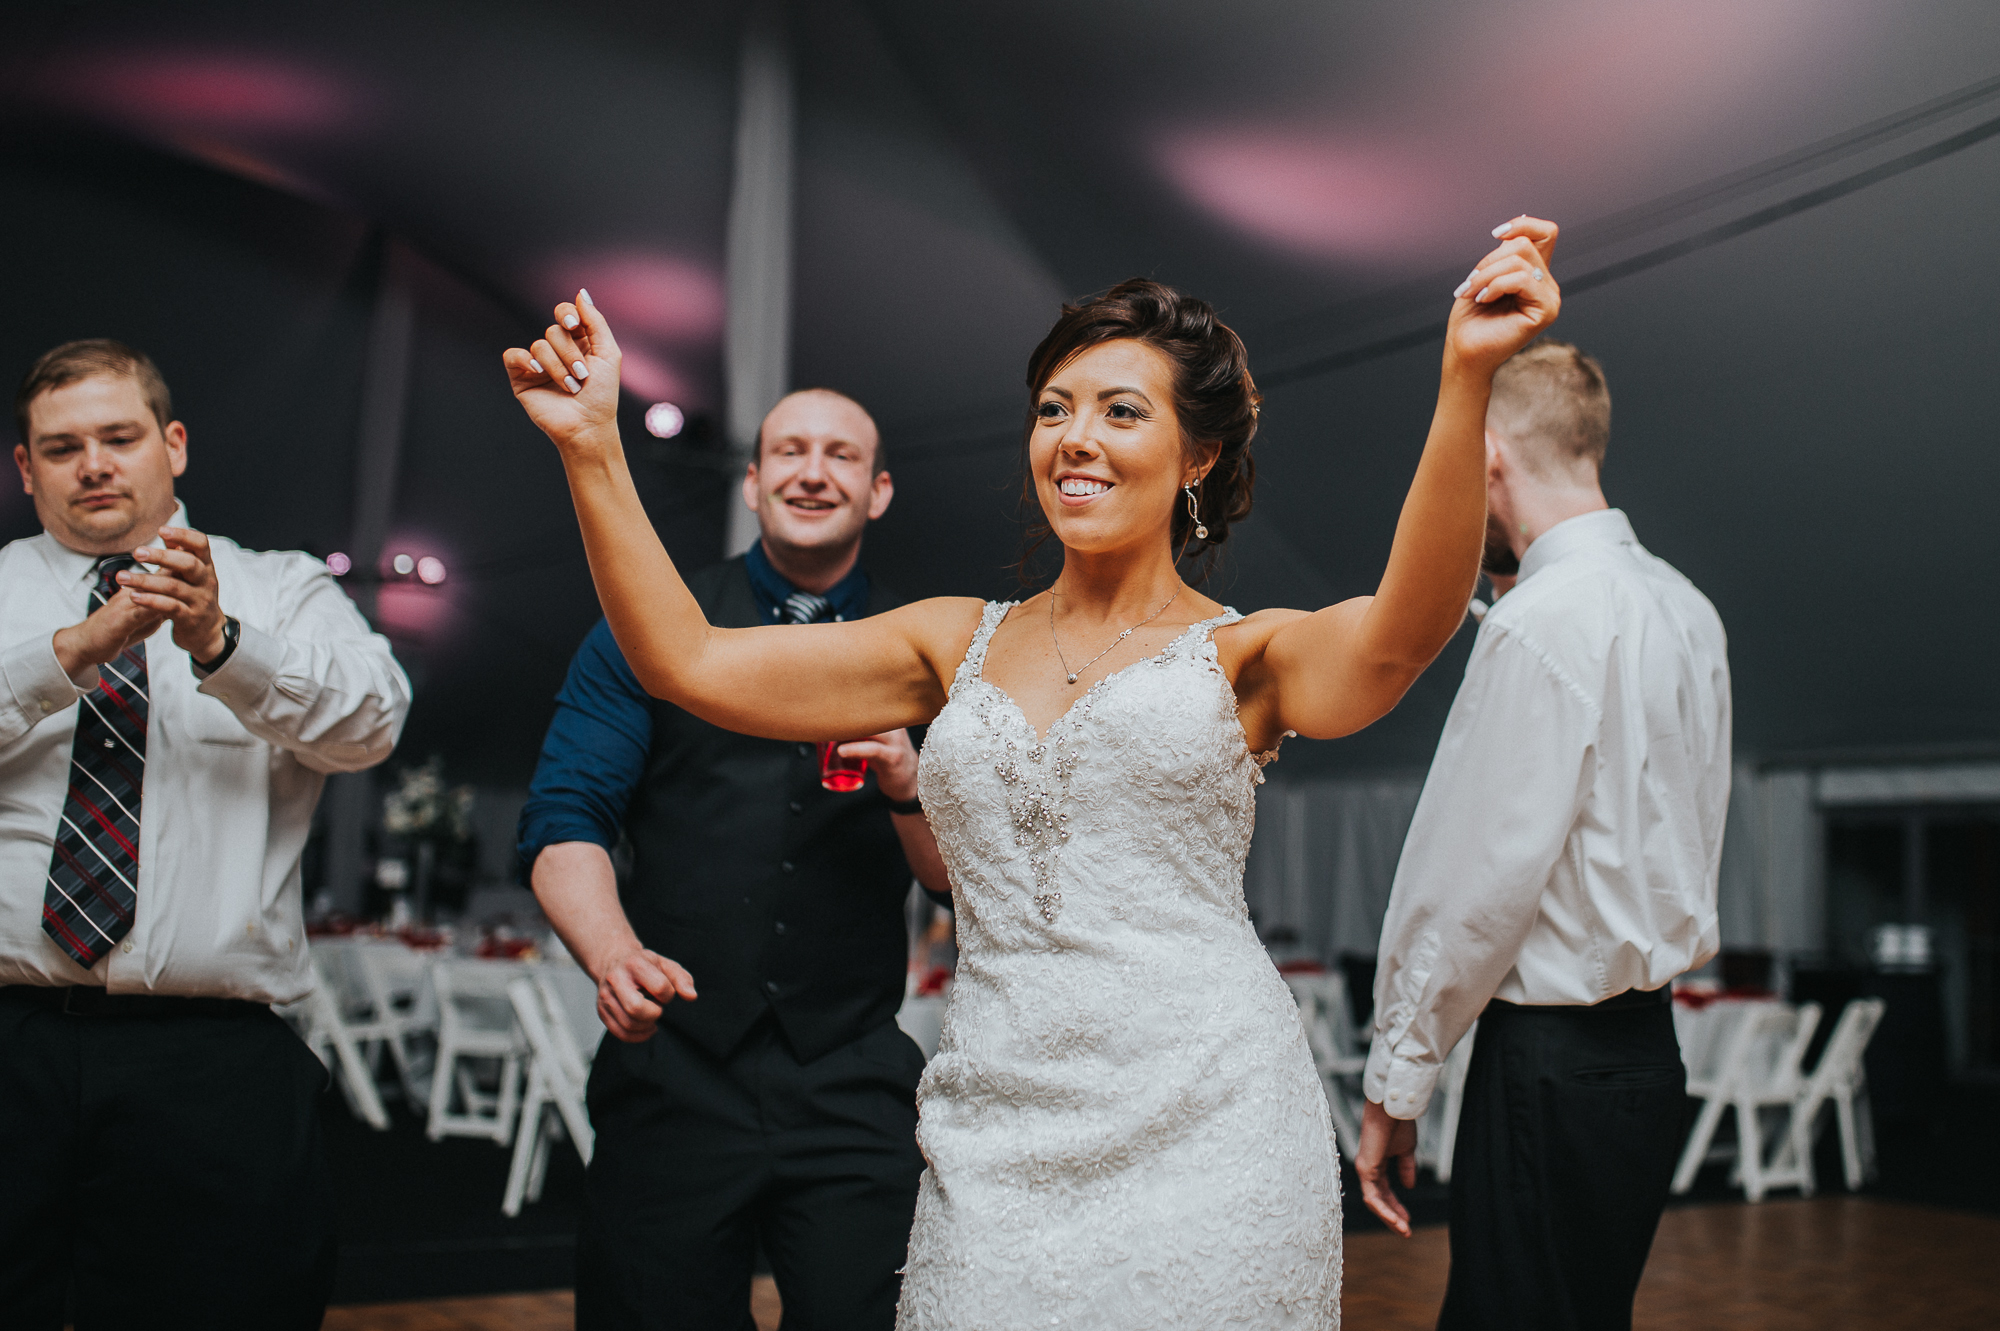 Christina-and-Gene-Wedding-Marla-Rain-Photography-650.jpg